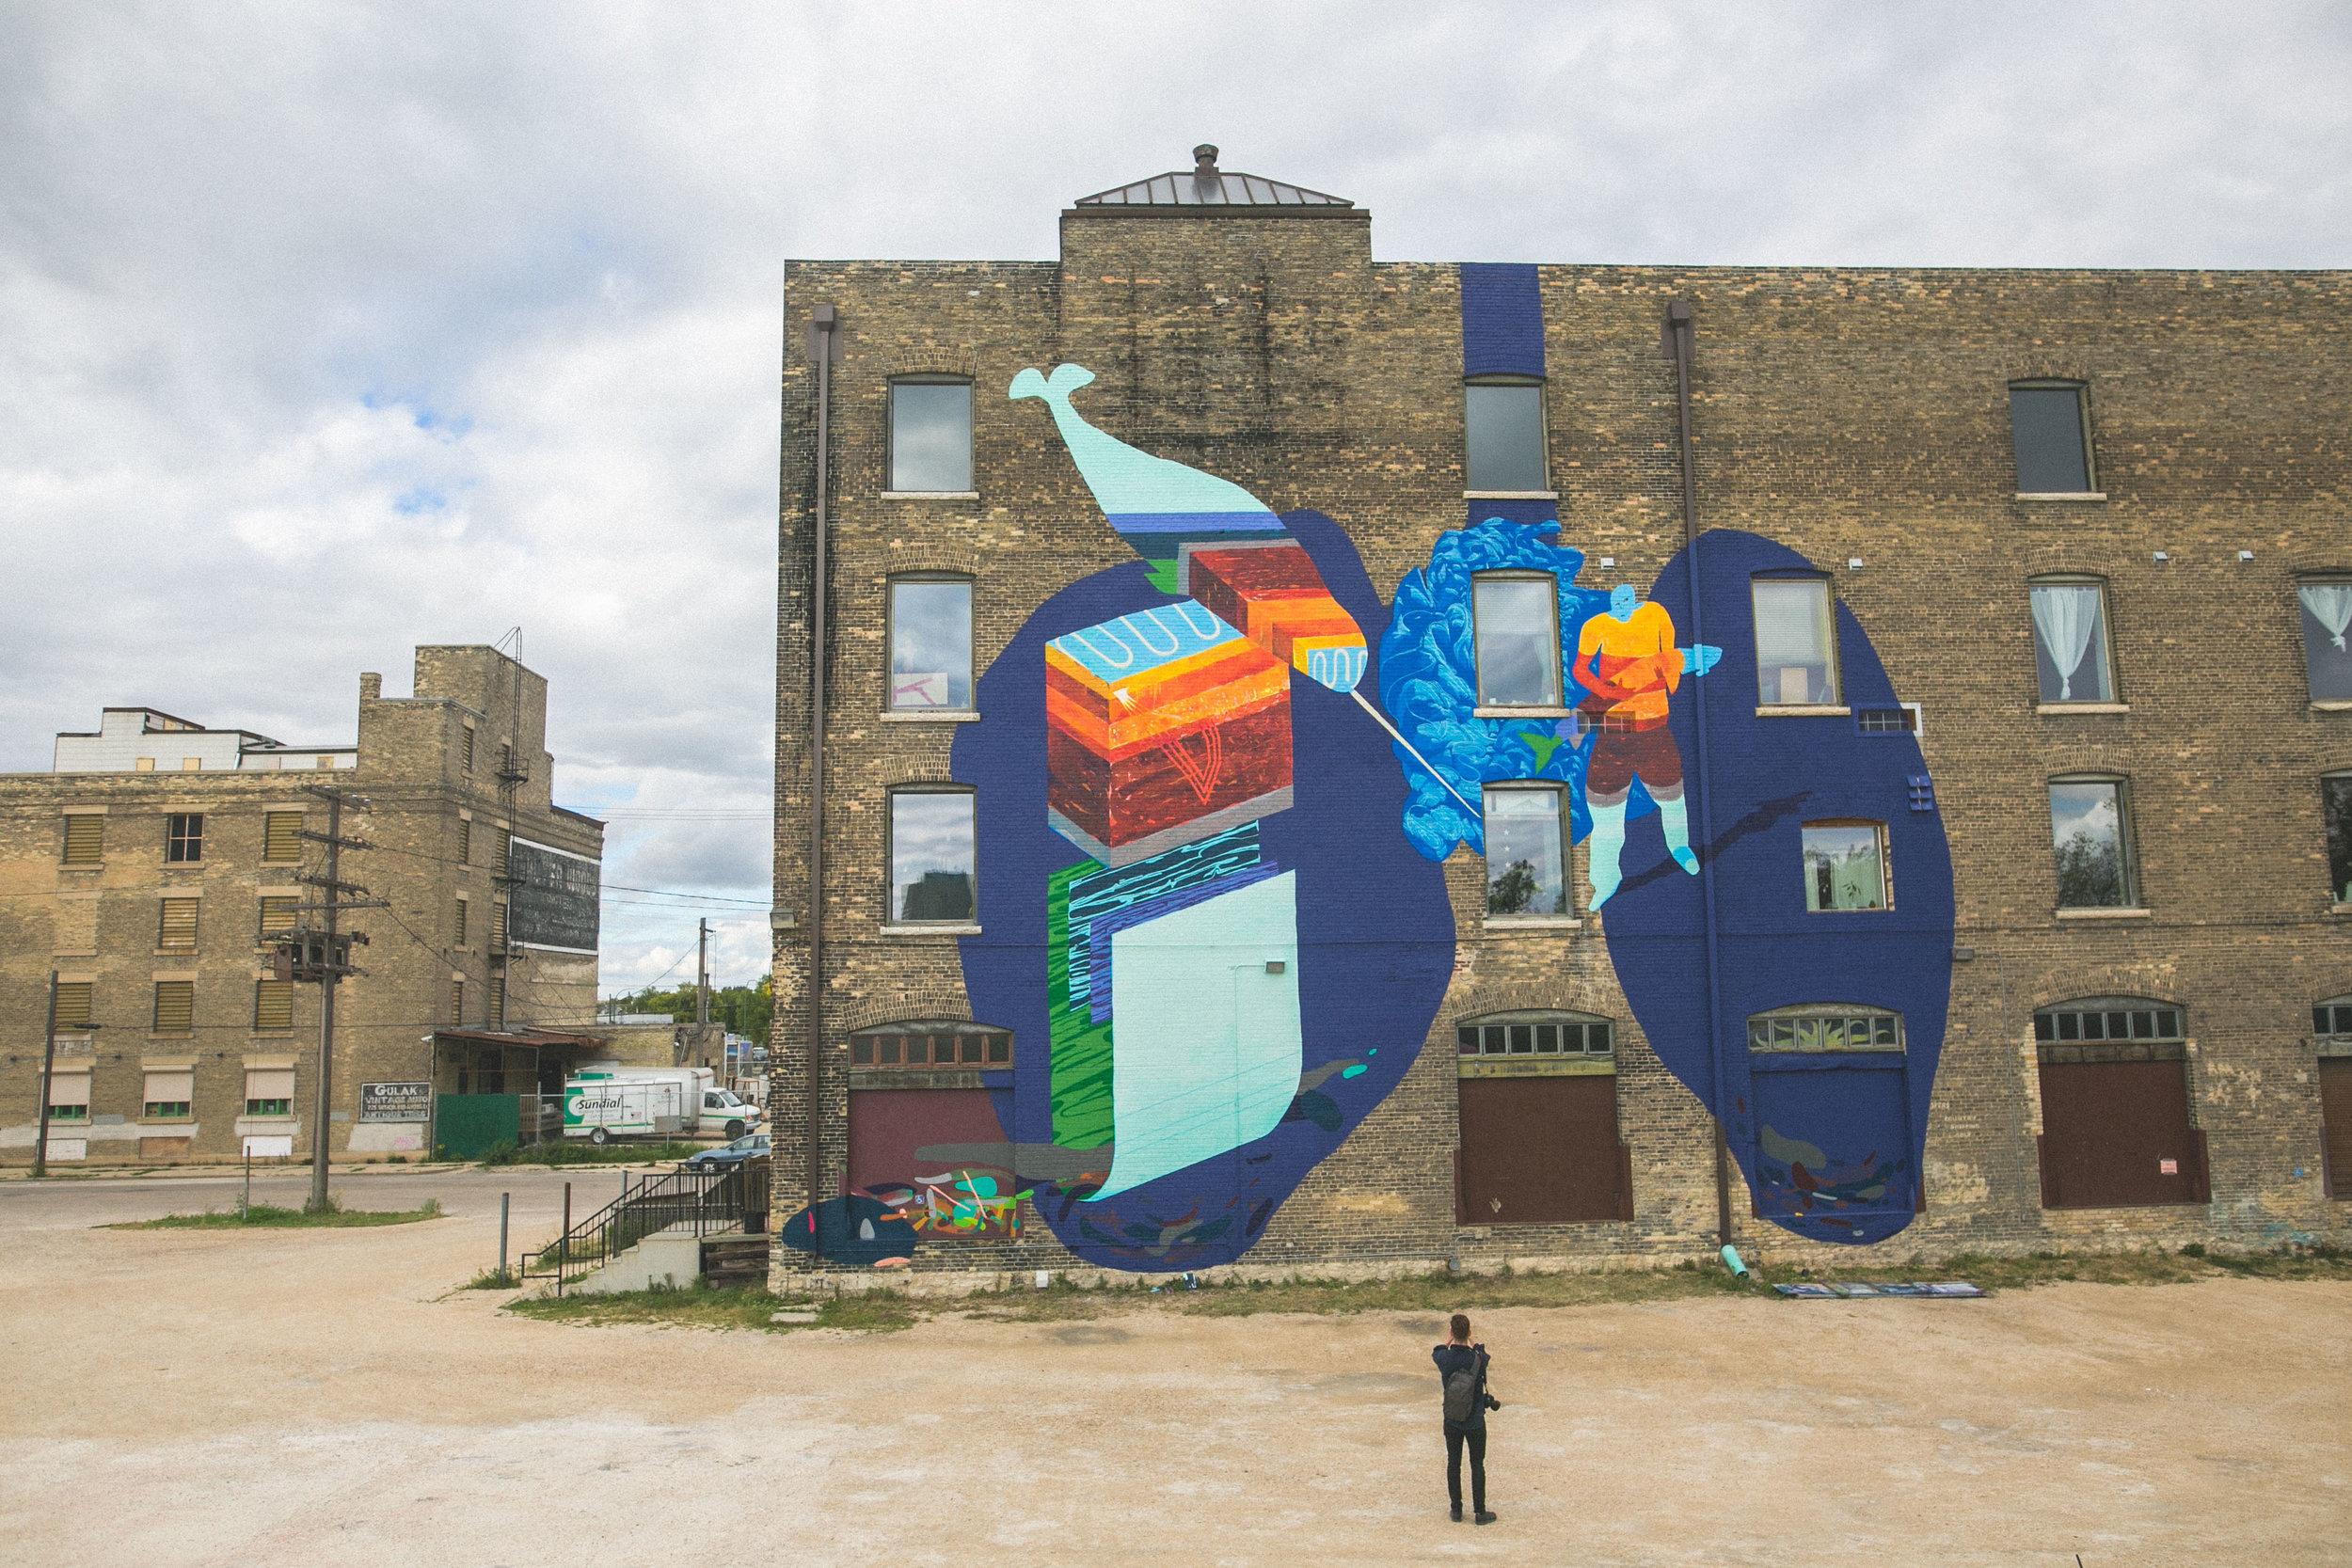 Aqua Lungs, with Parr Josephee,Photo Courtesy of Joseph Visser and Synonym Art Consultation, Wall-to-Wall Festival 2016, Winnipeg